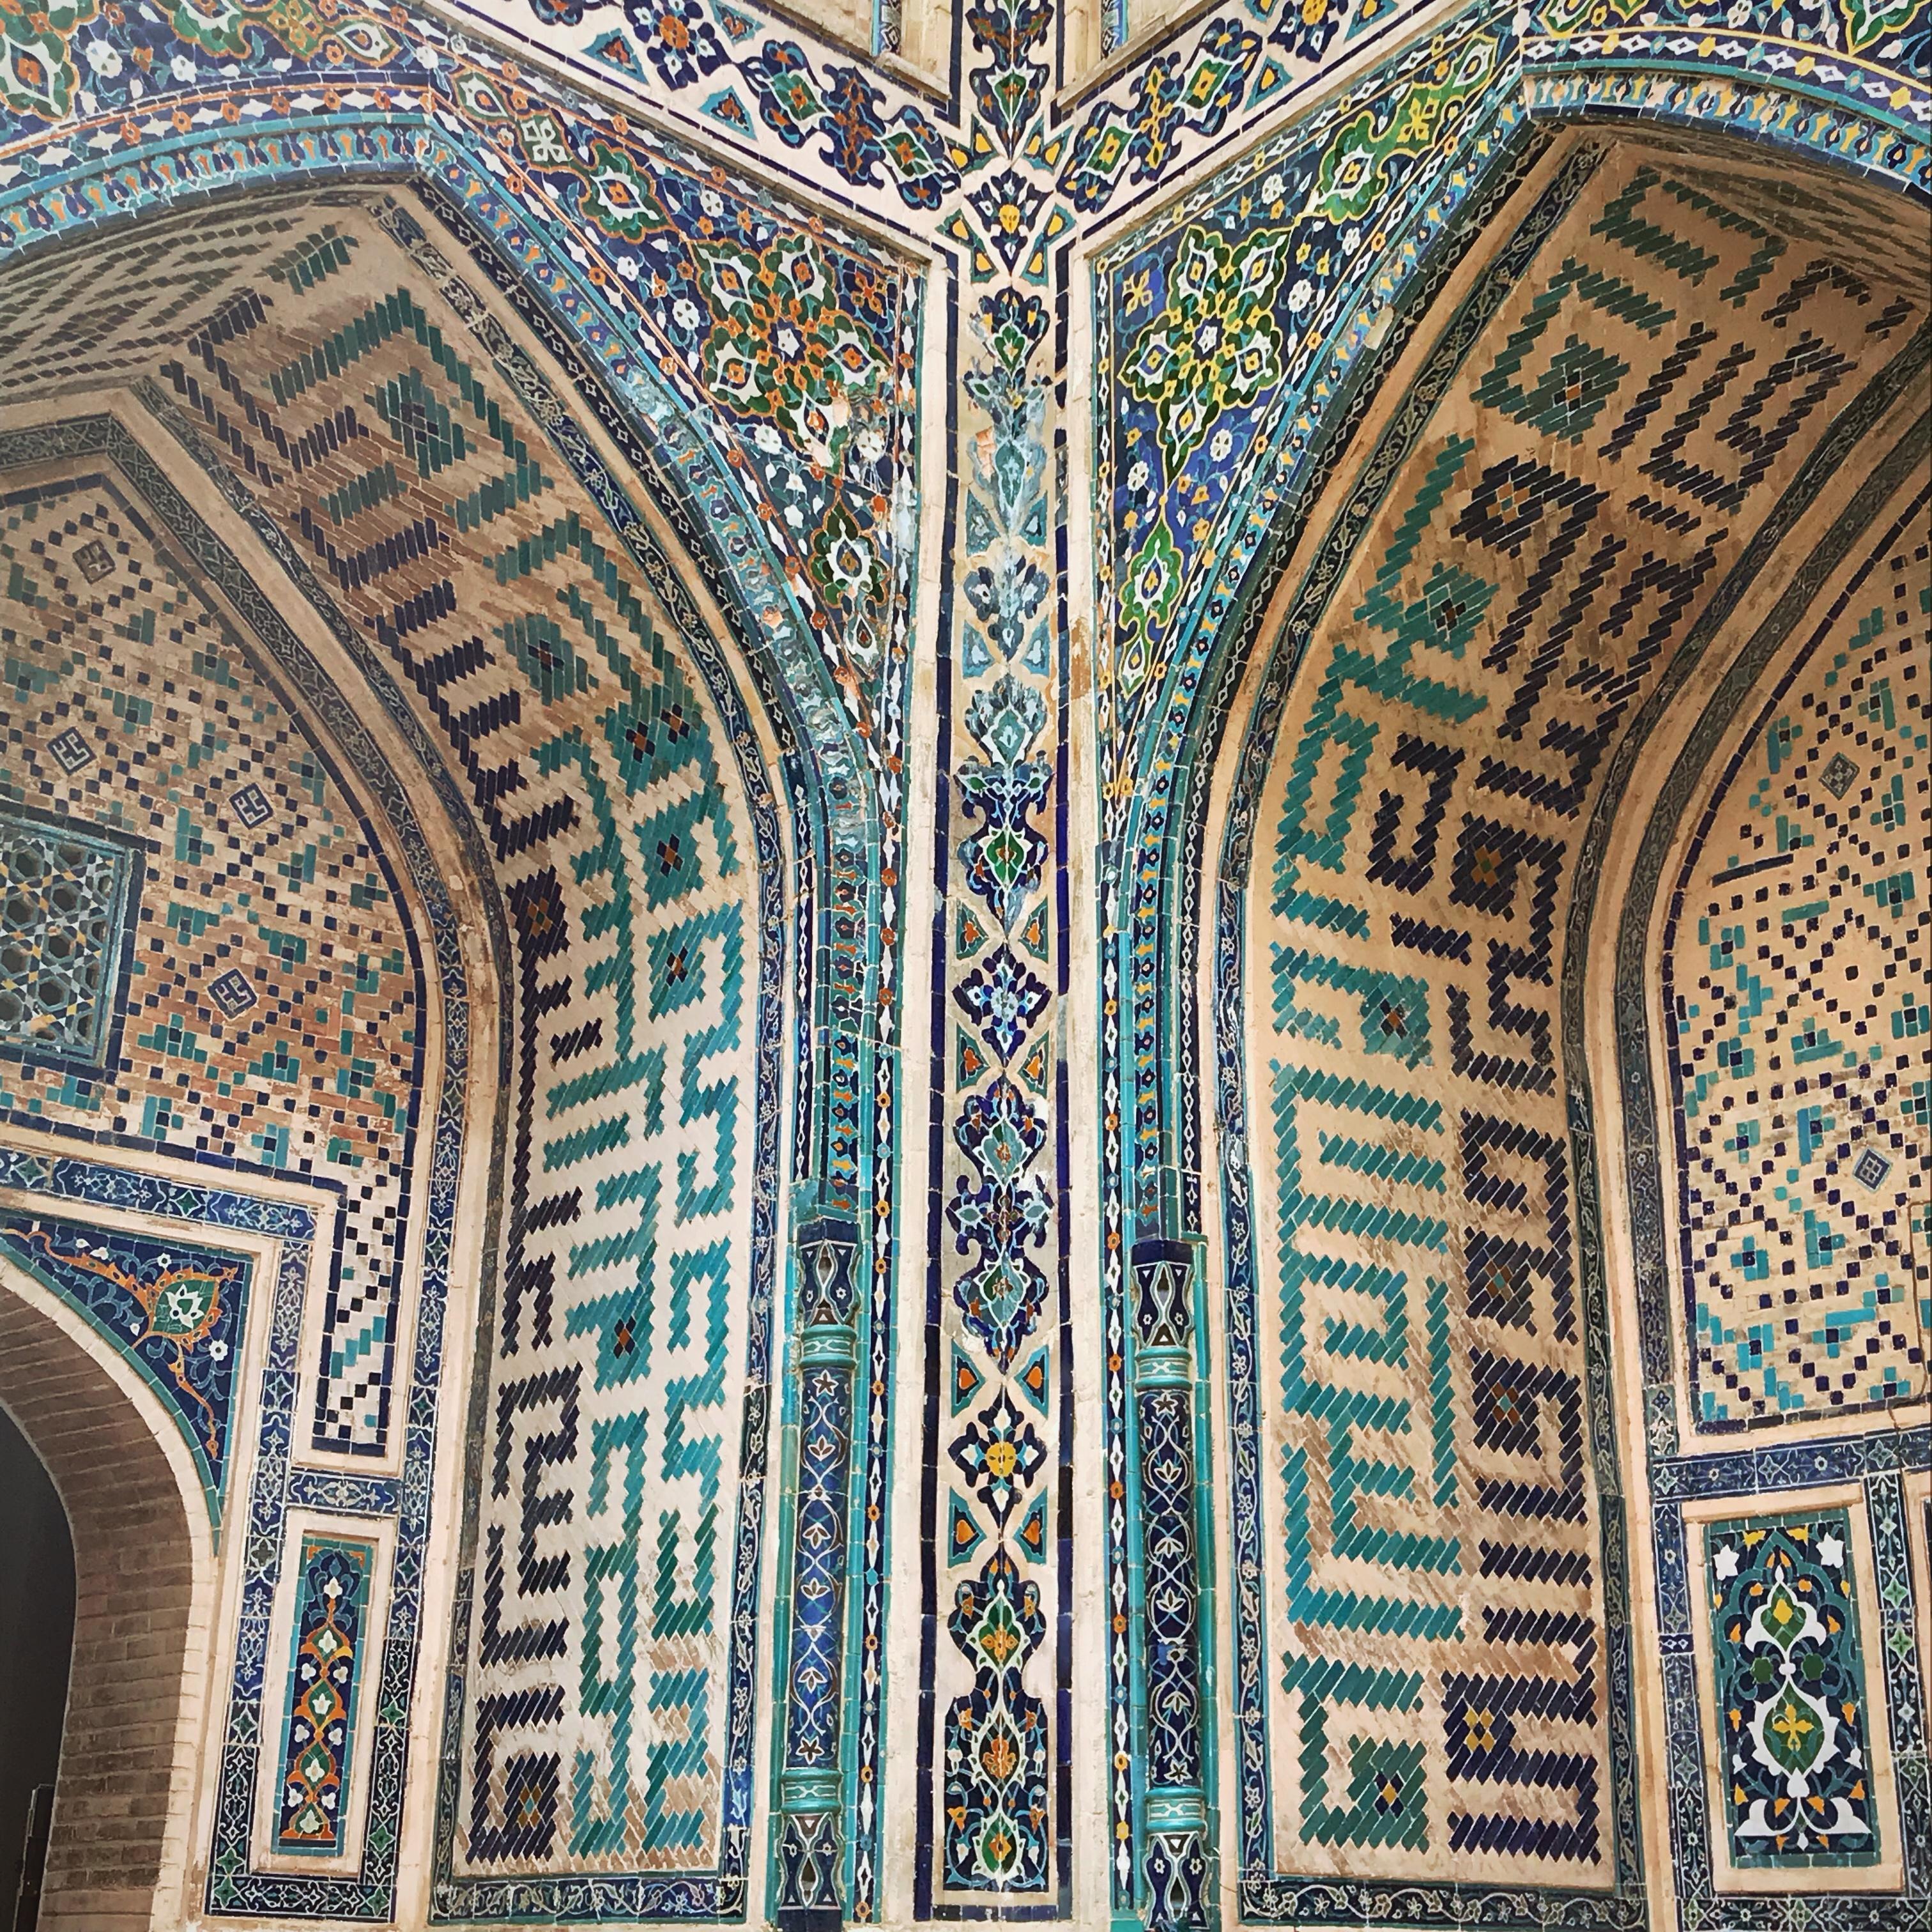 Usbekistan kscheib Kacheln Portale